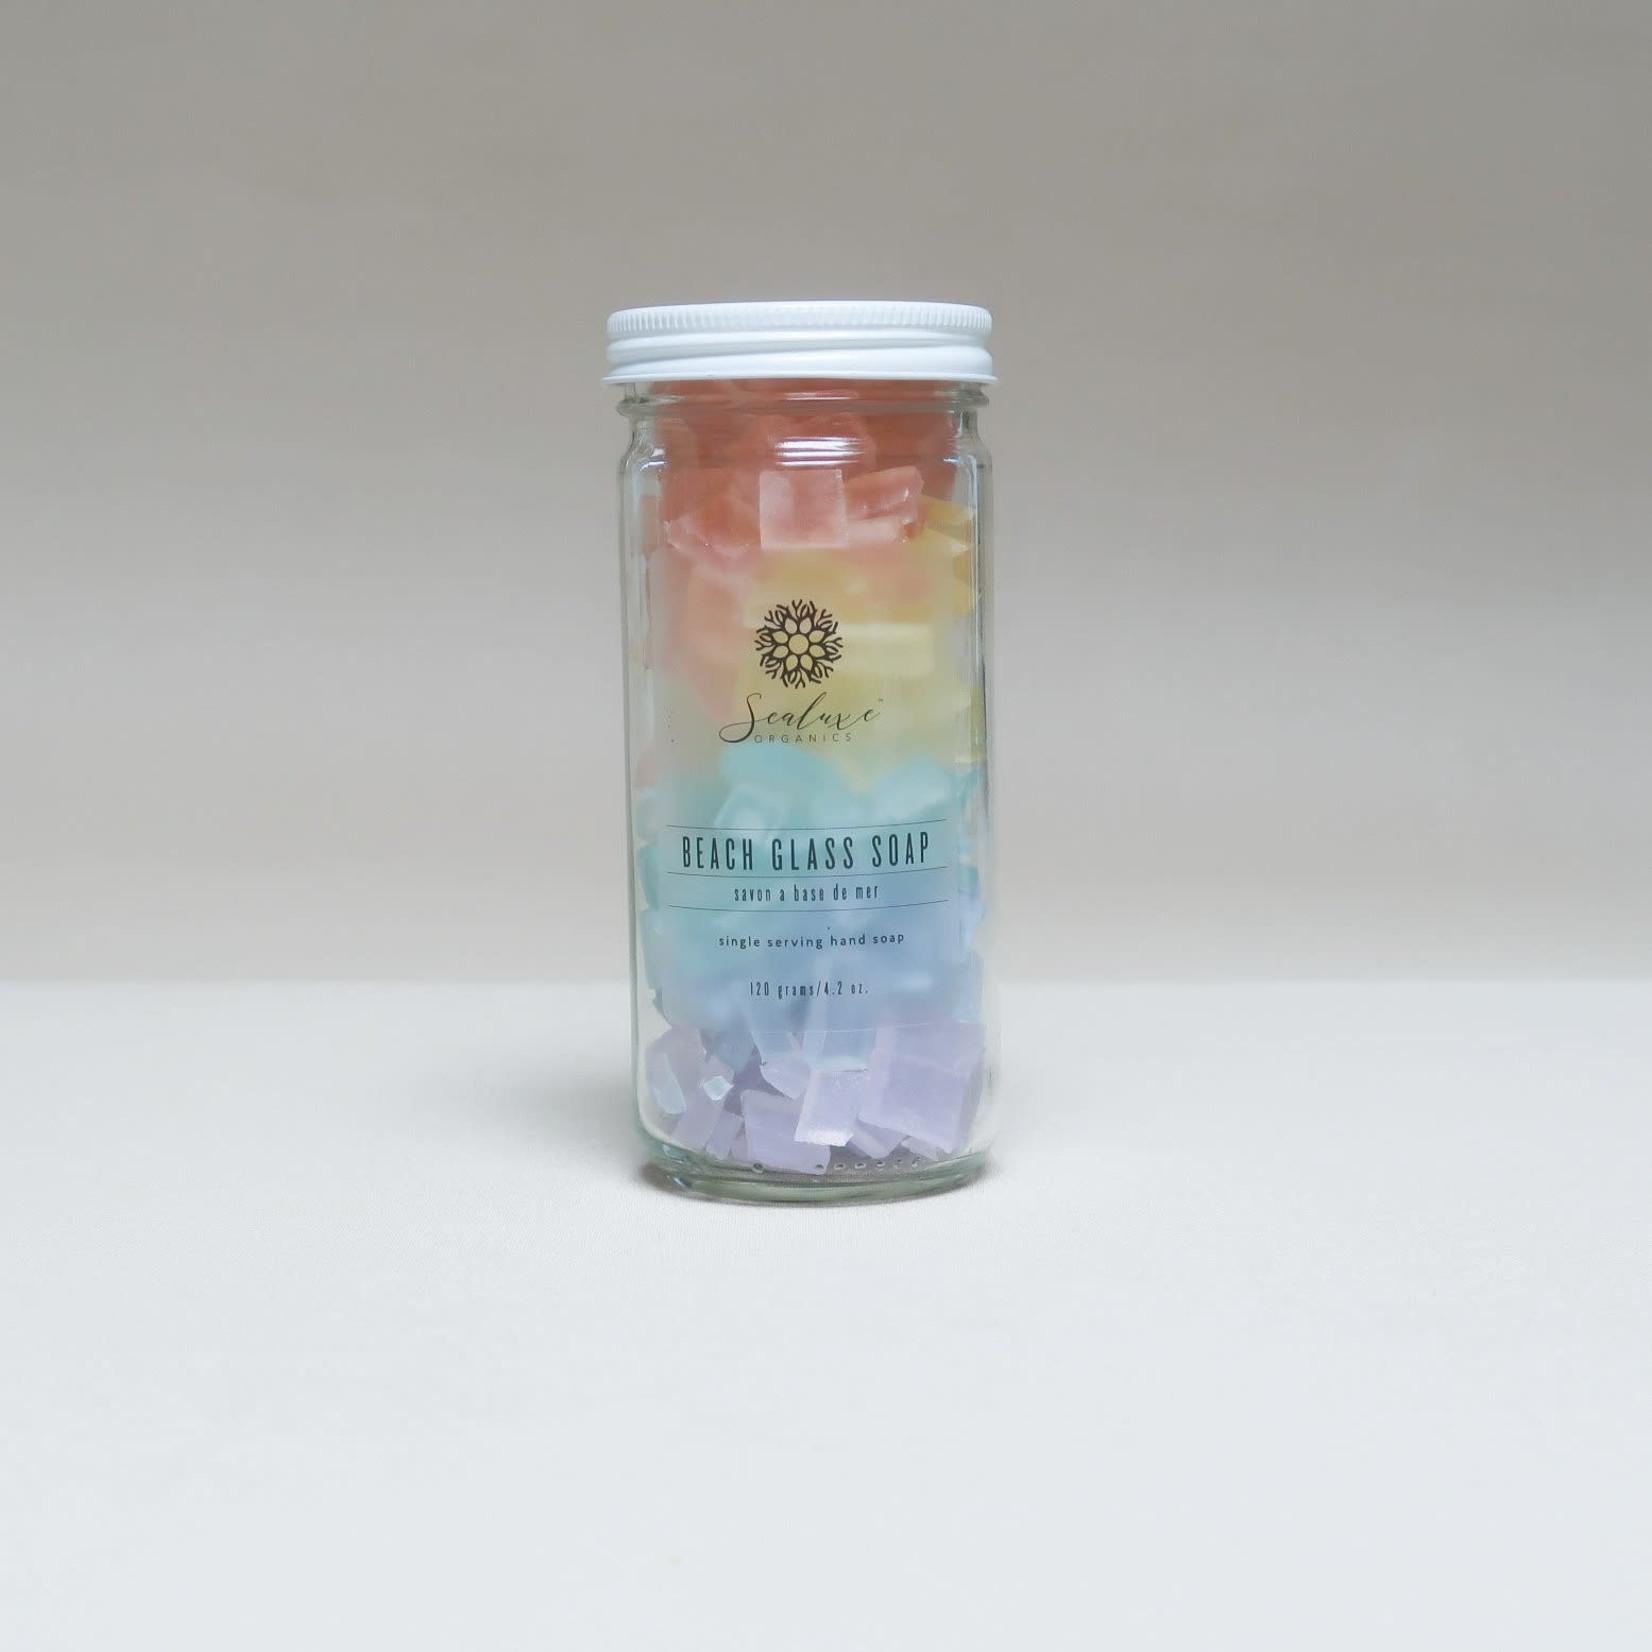 SEALUXE ORGANICS BEACH GLASS SOAP - RAINBOW